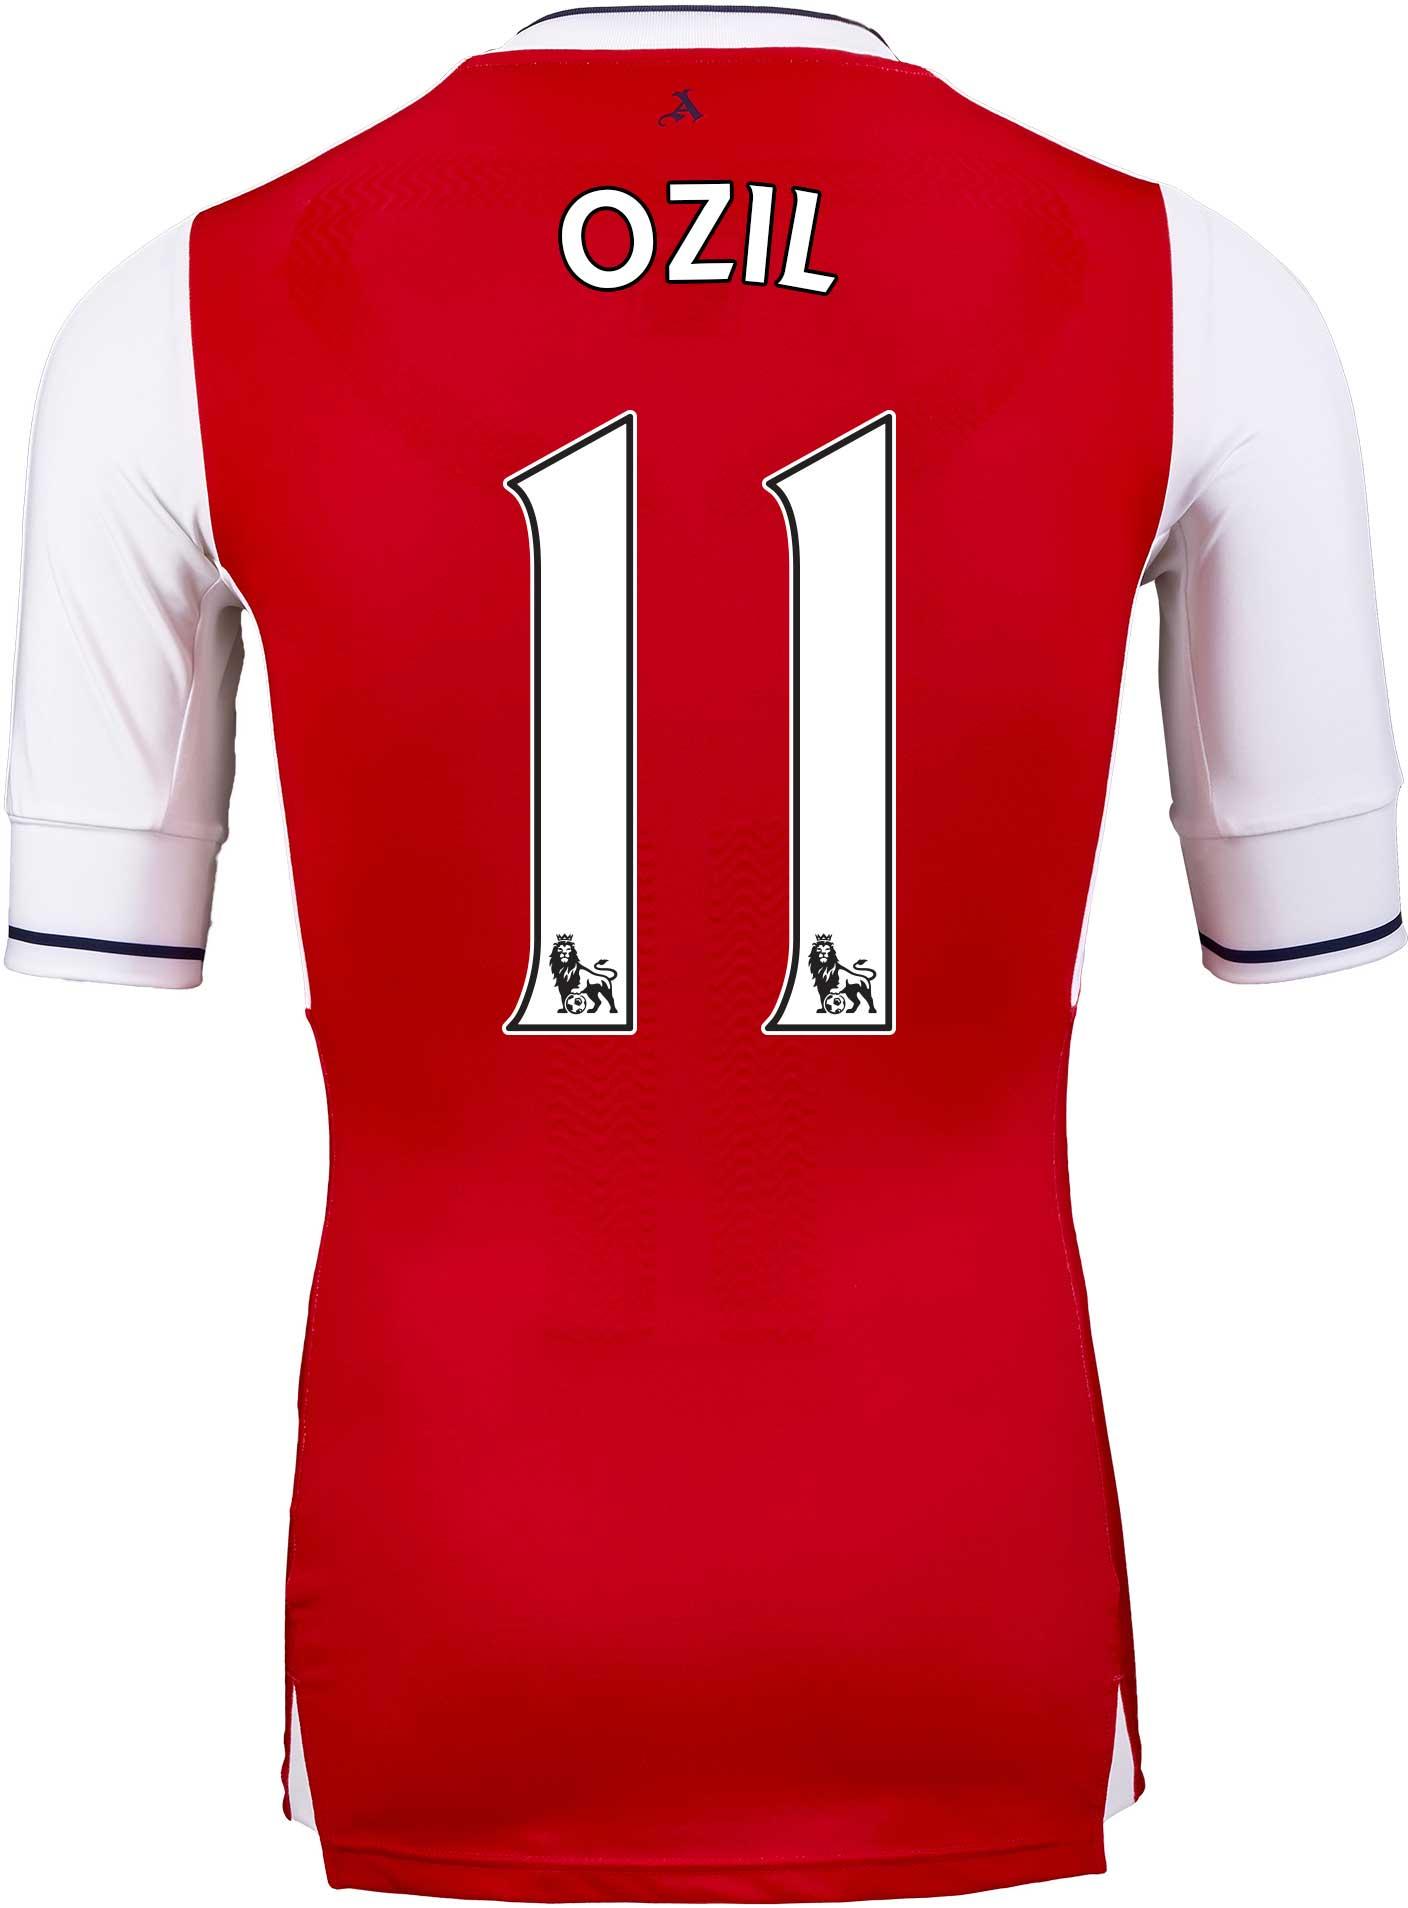 Ozil Arsenal Puma | www.pixshark.com - Images Galleries ...